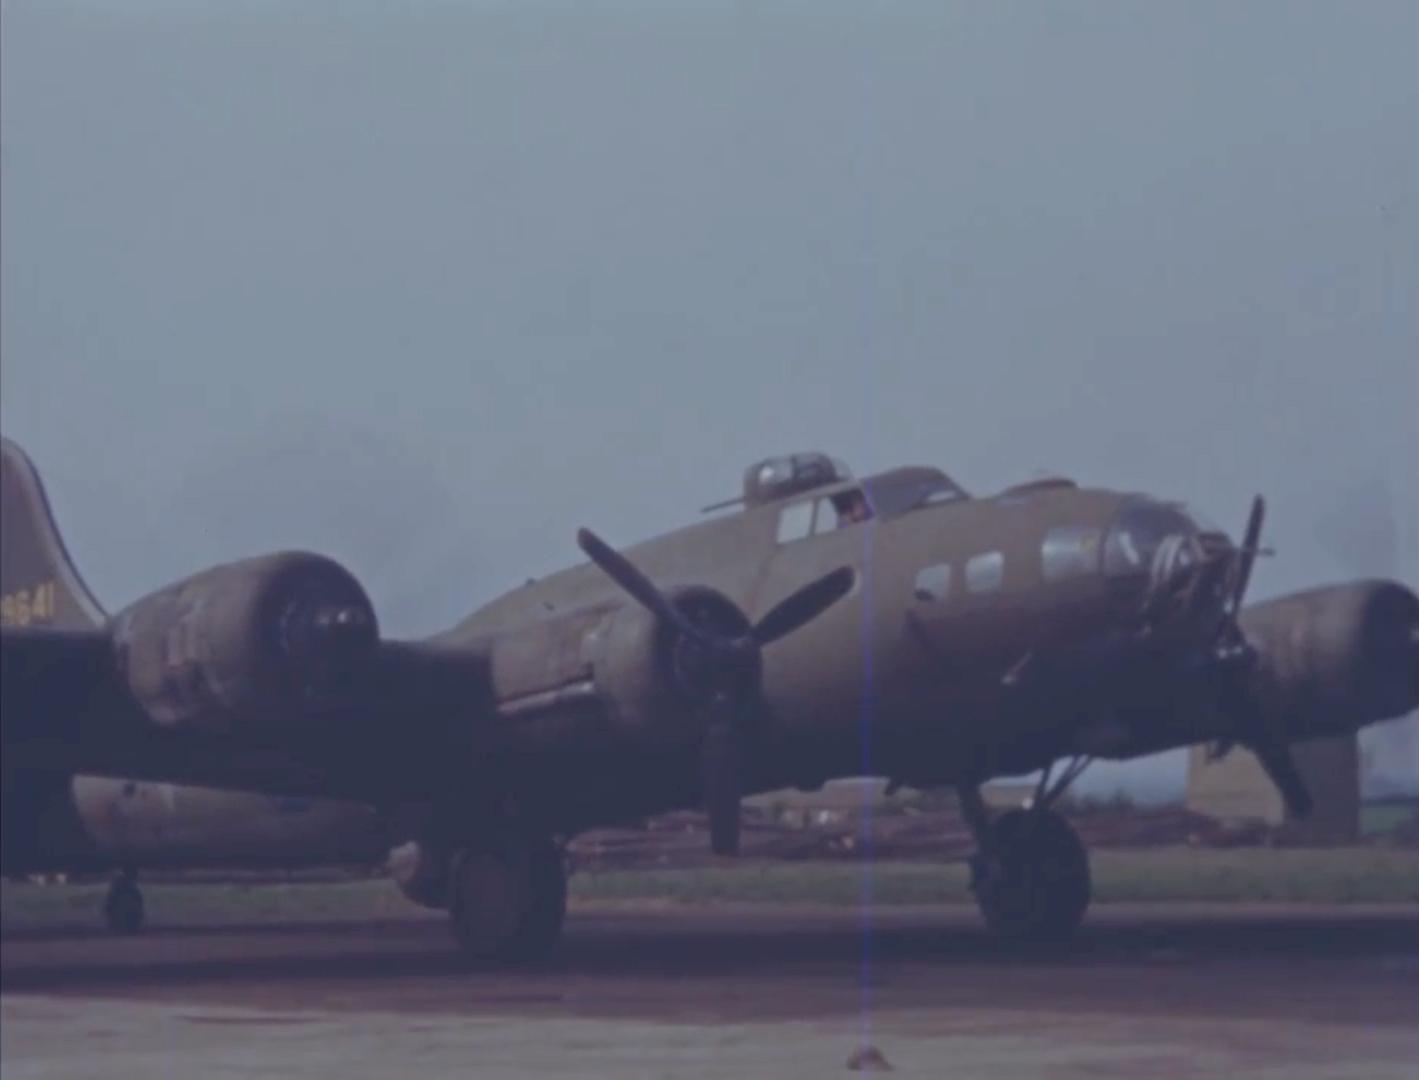 B-17 42-29641